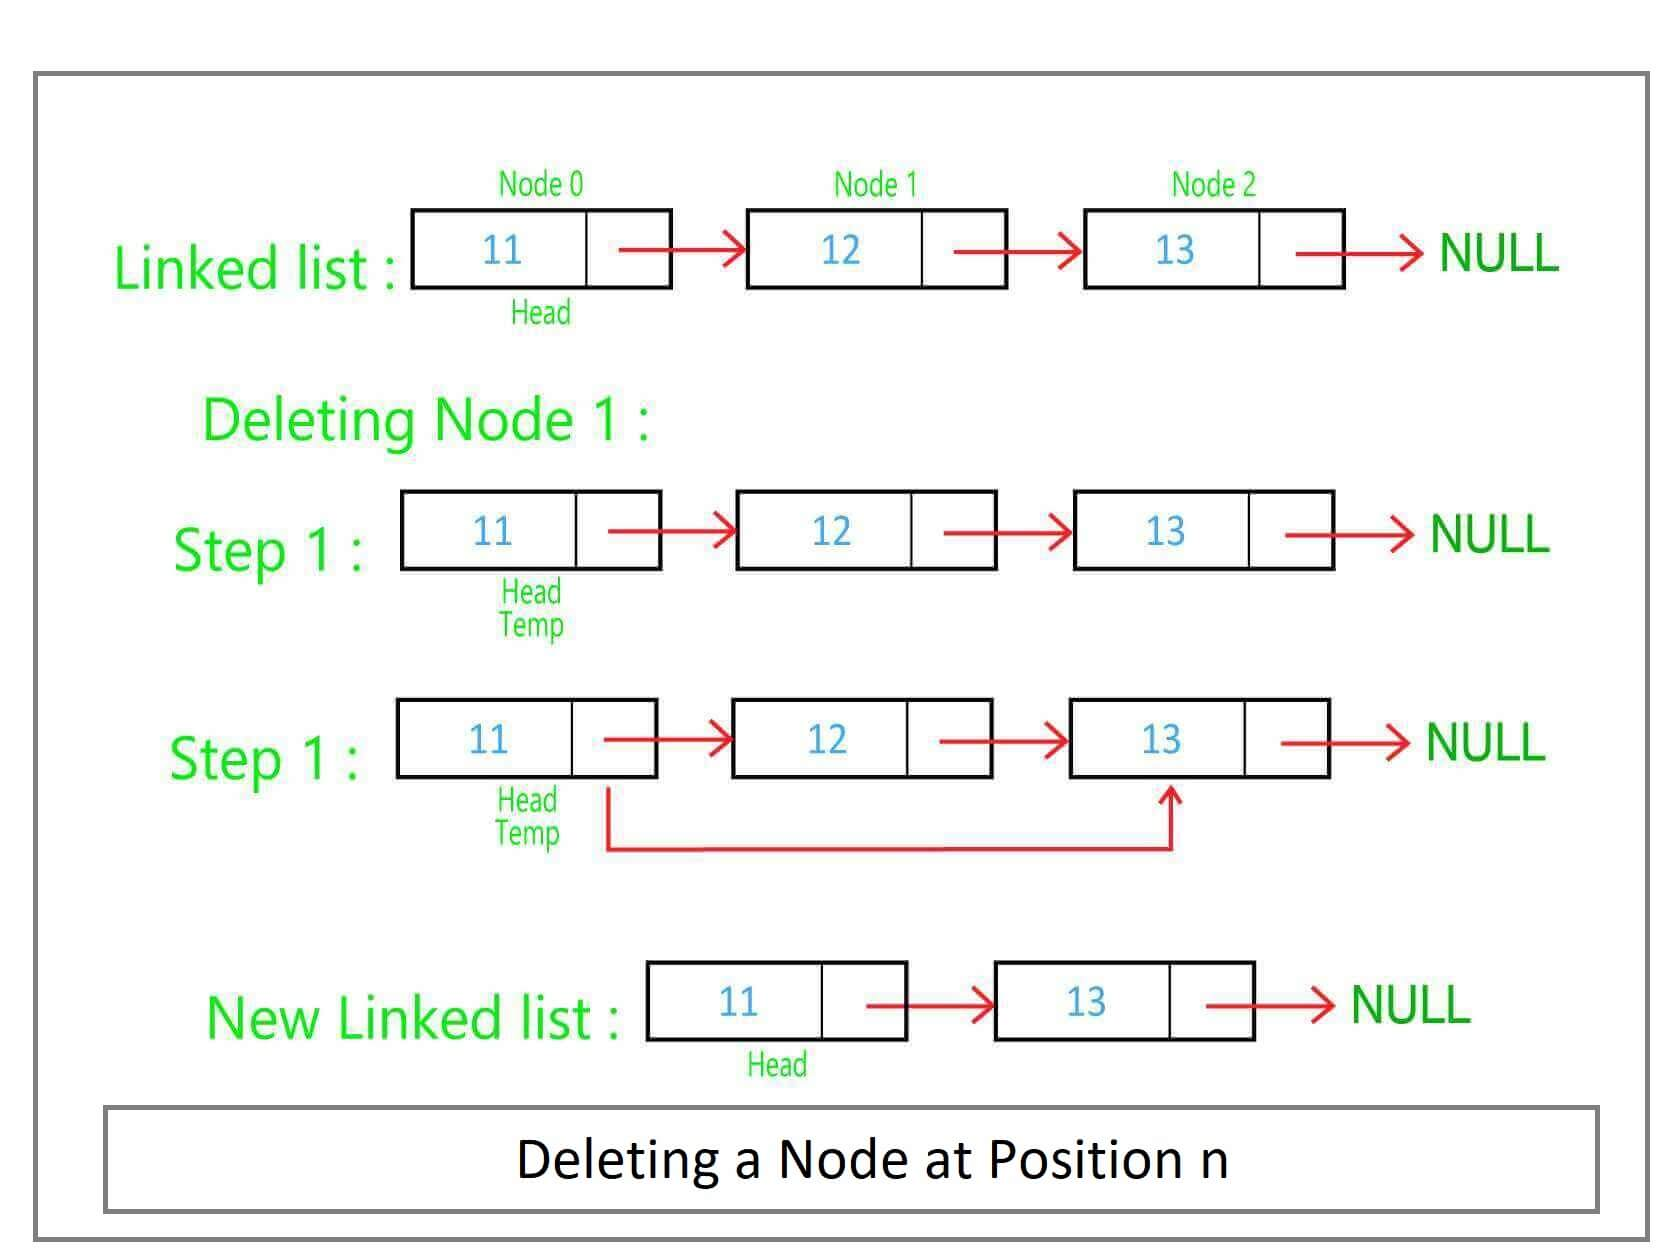 Deleting a Node at Position n in Linked List Diagram